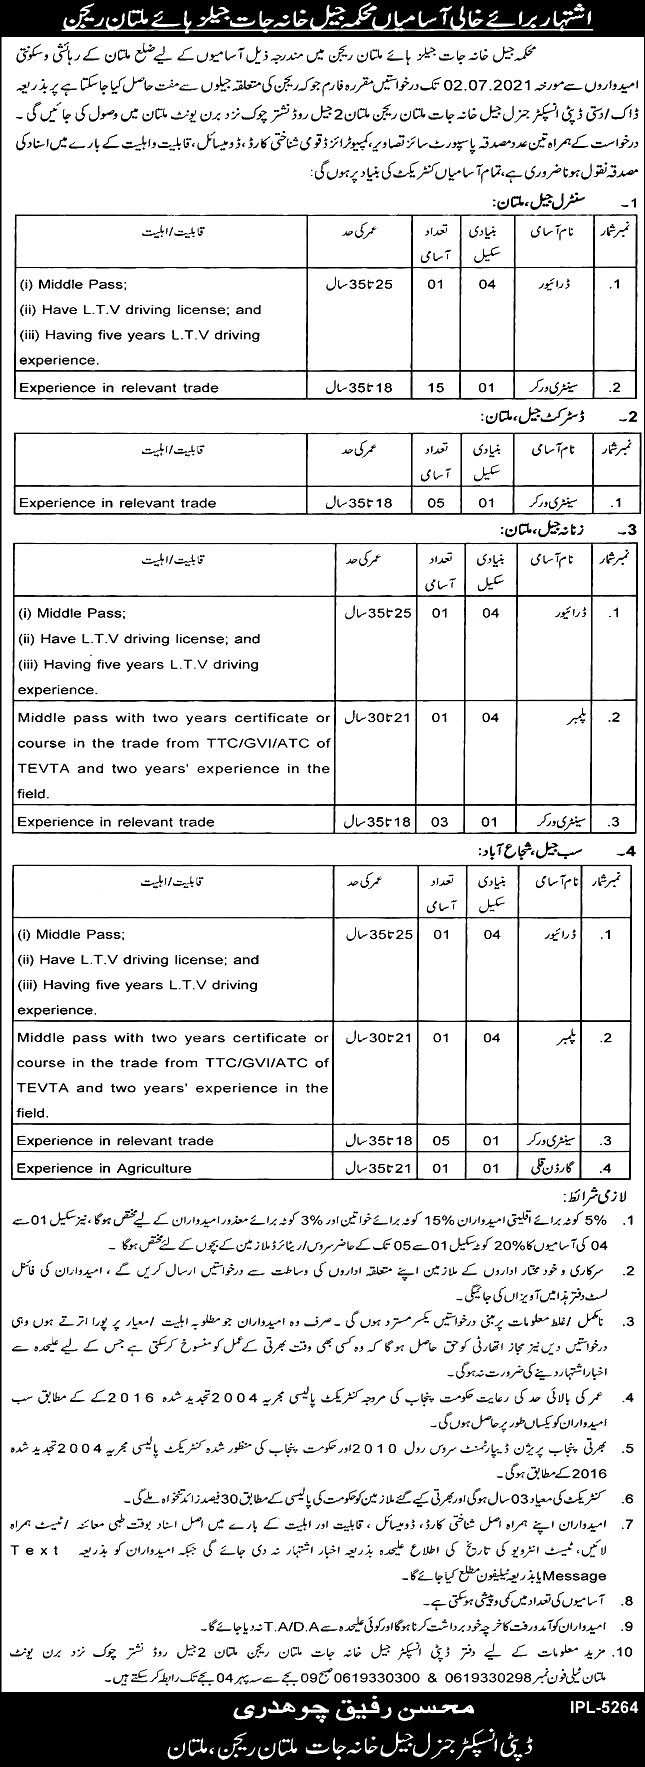 Prison Department Punjab Latest Jobs June 2021 in Multan Region